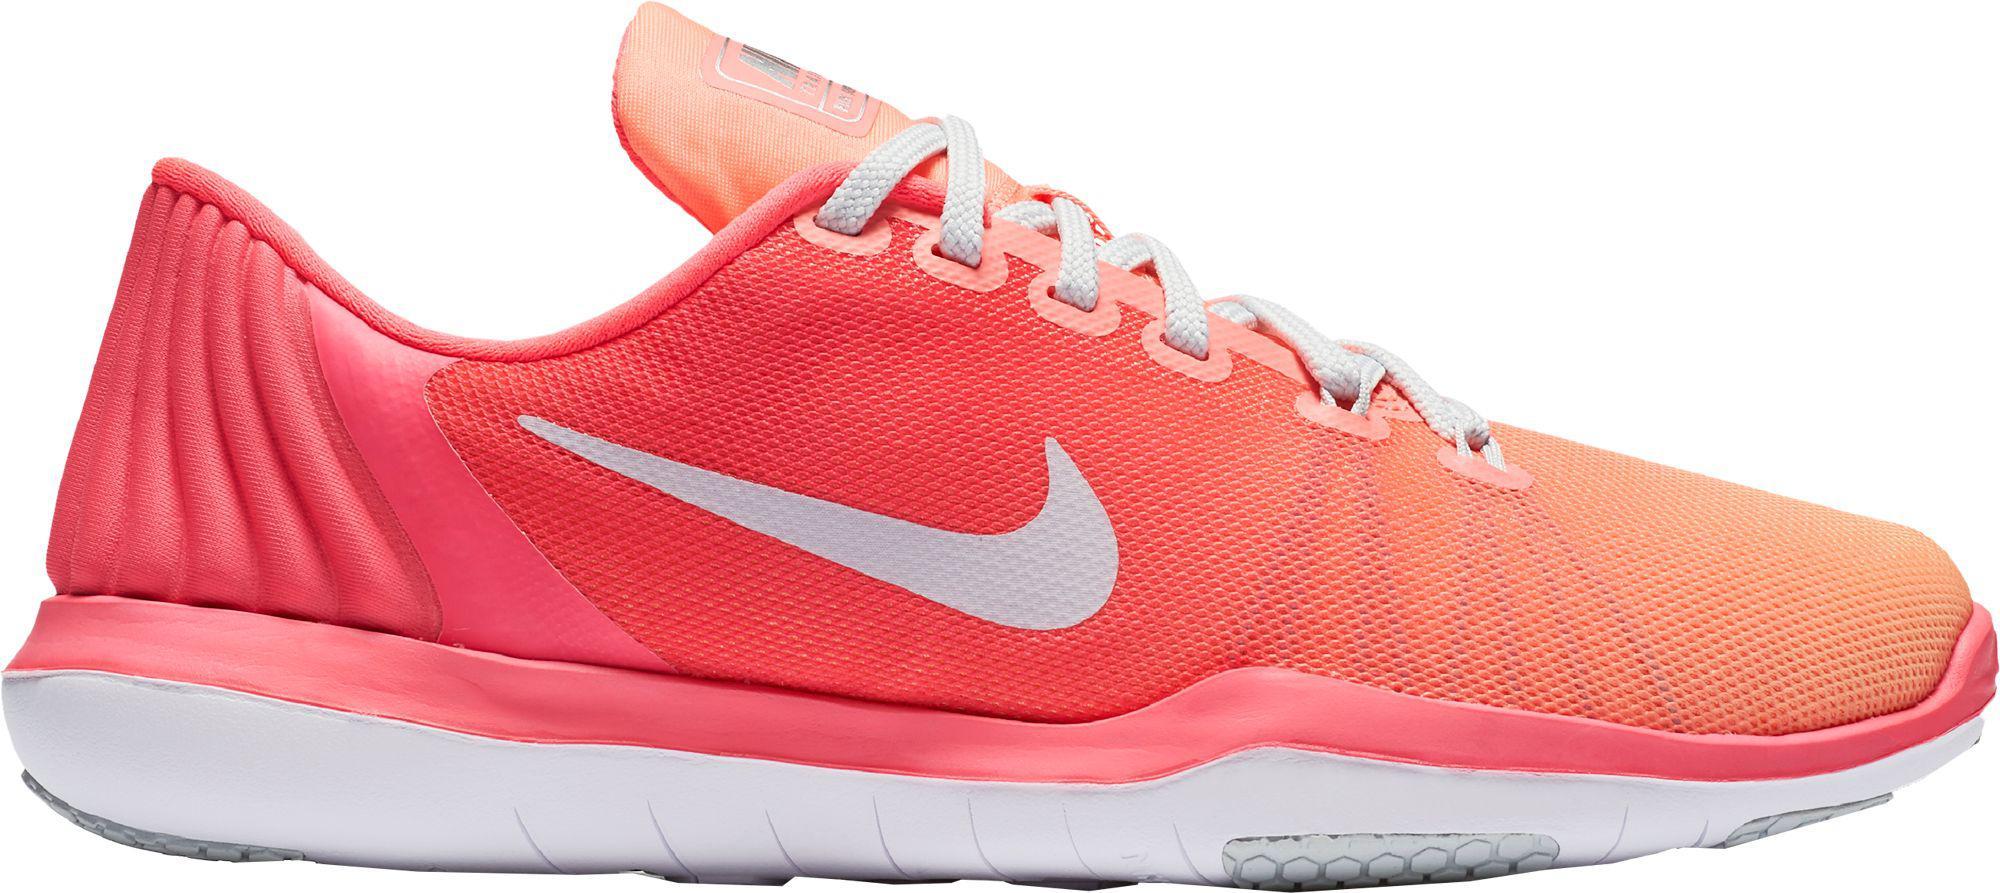 87a45fafb3600 Lyst - Nike Flex Supreme Tr 5 Fade Training Shoes